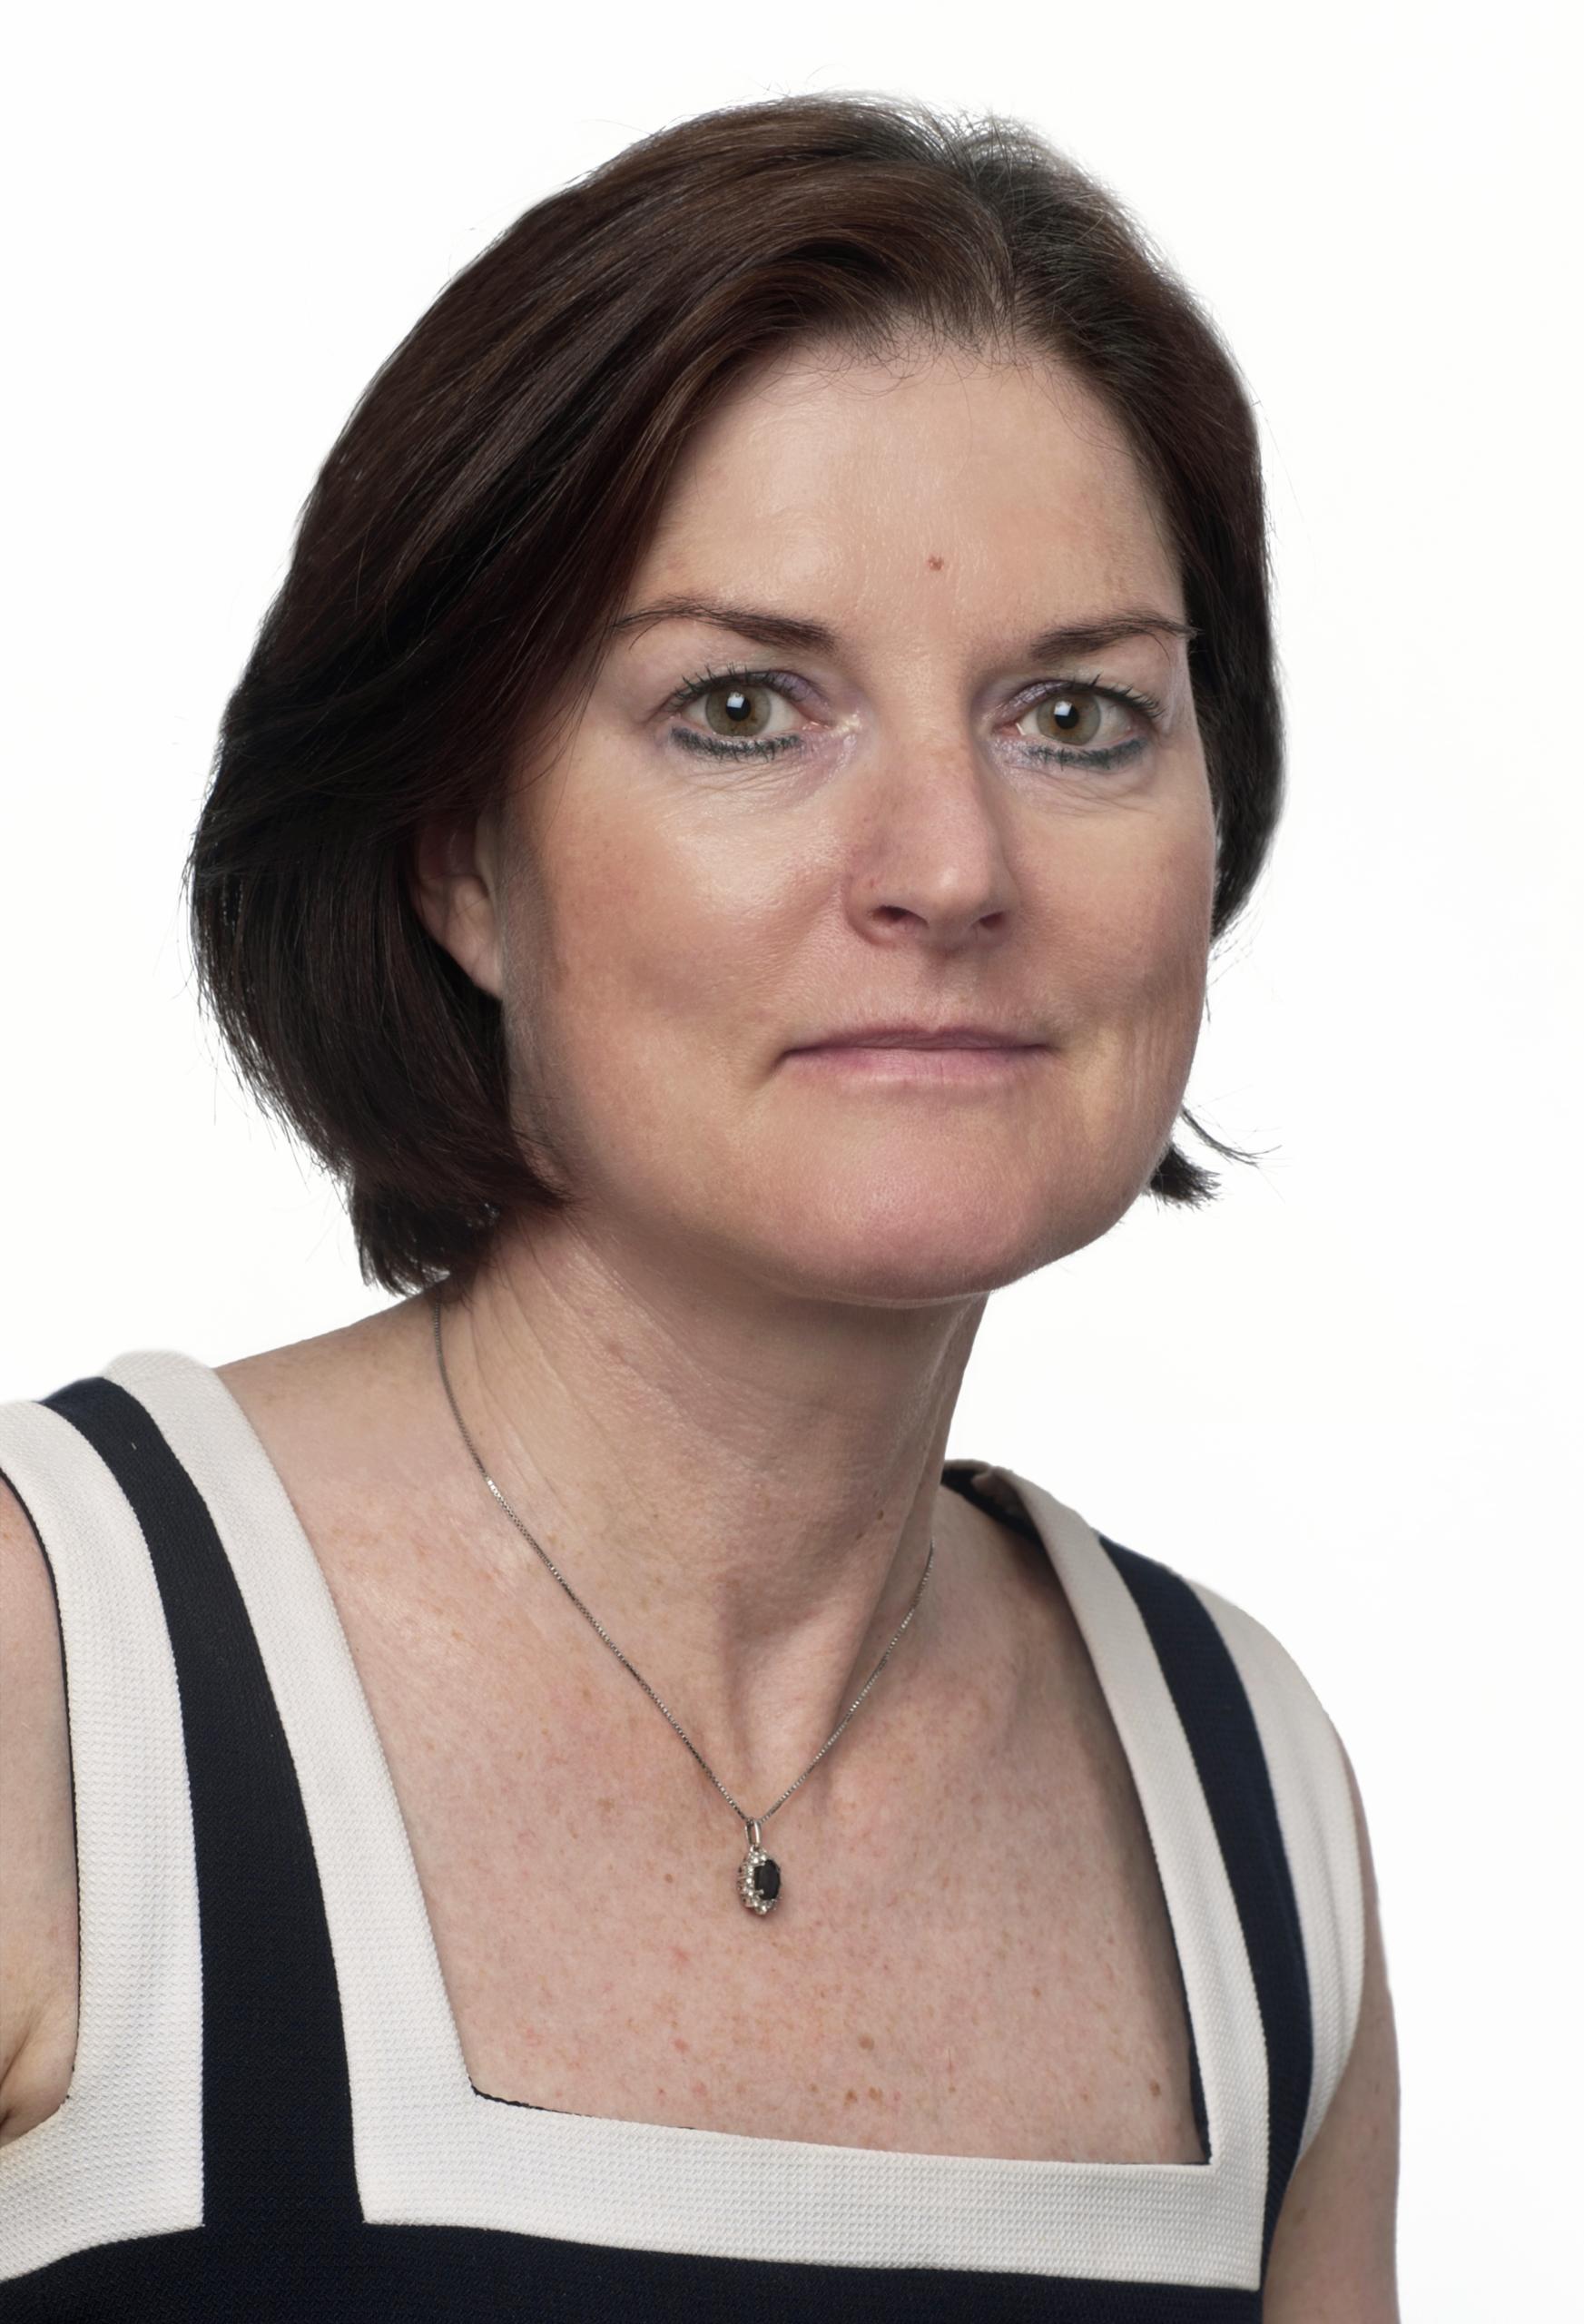 Anja Grenner